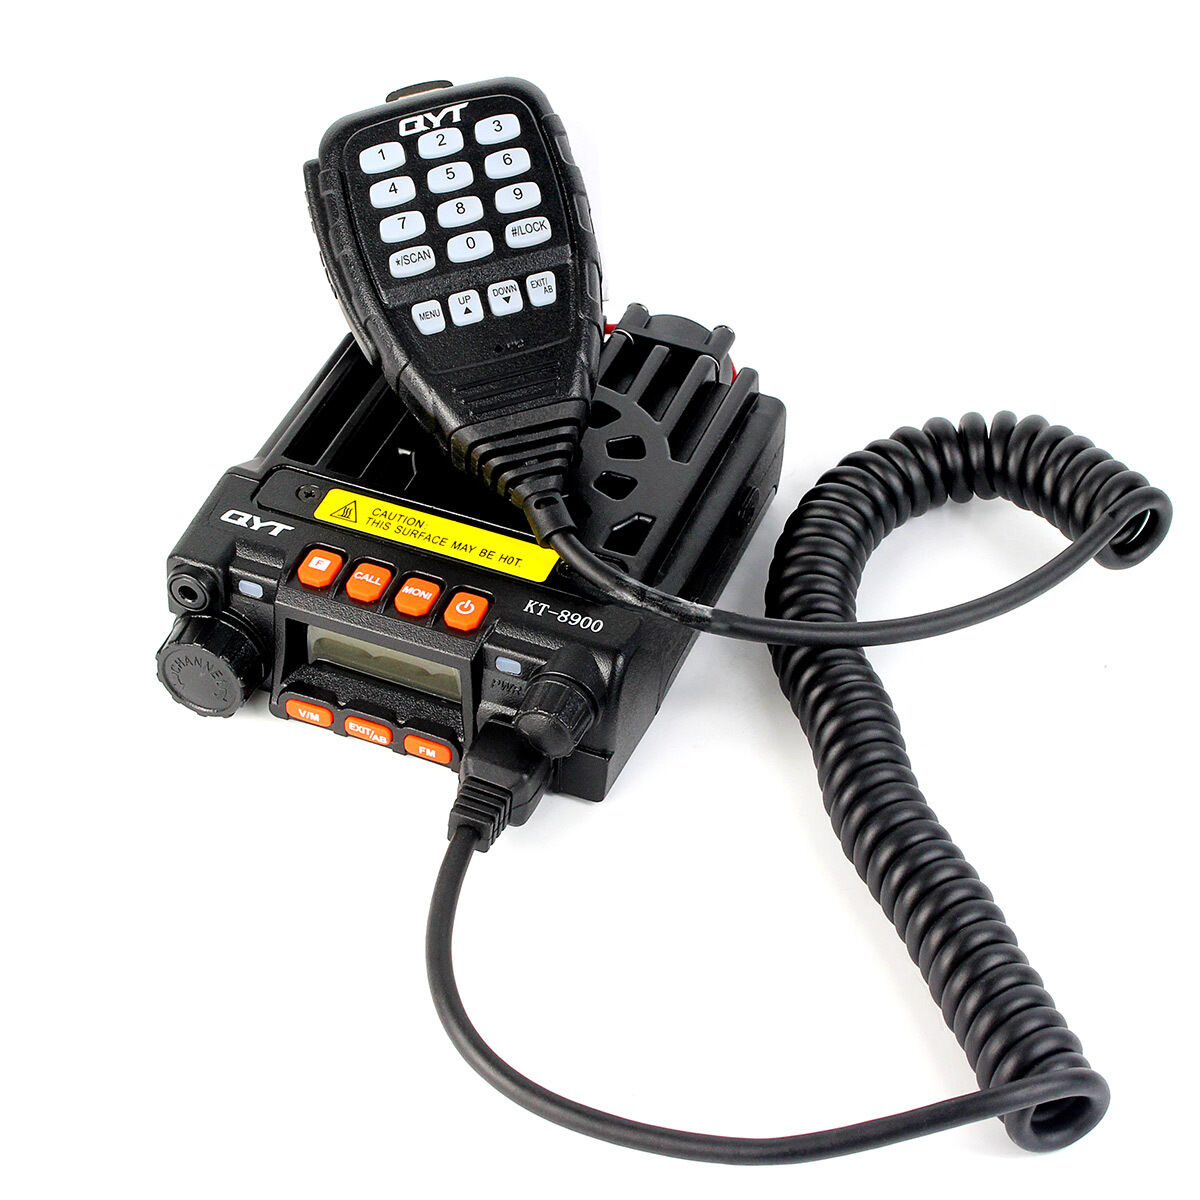 Mobile Car Radio Dual Band Vehicle Transceiver Uhf Vhf 20 25w Dtmf Remote Control Using Receiver Scrambler Uk